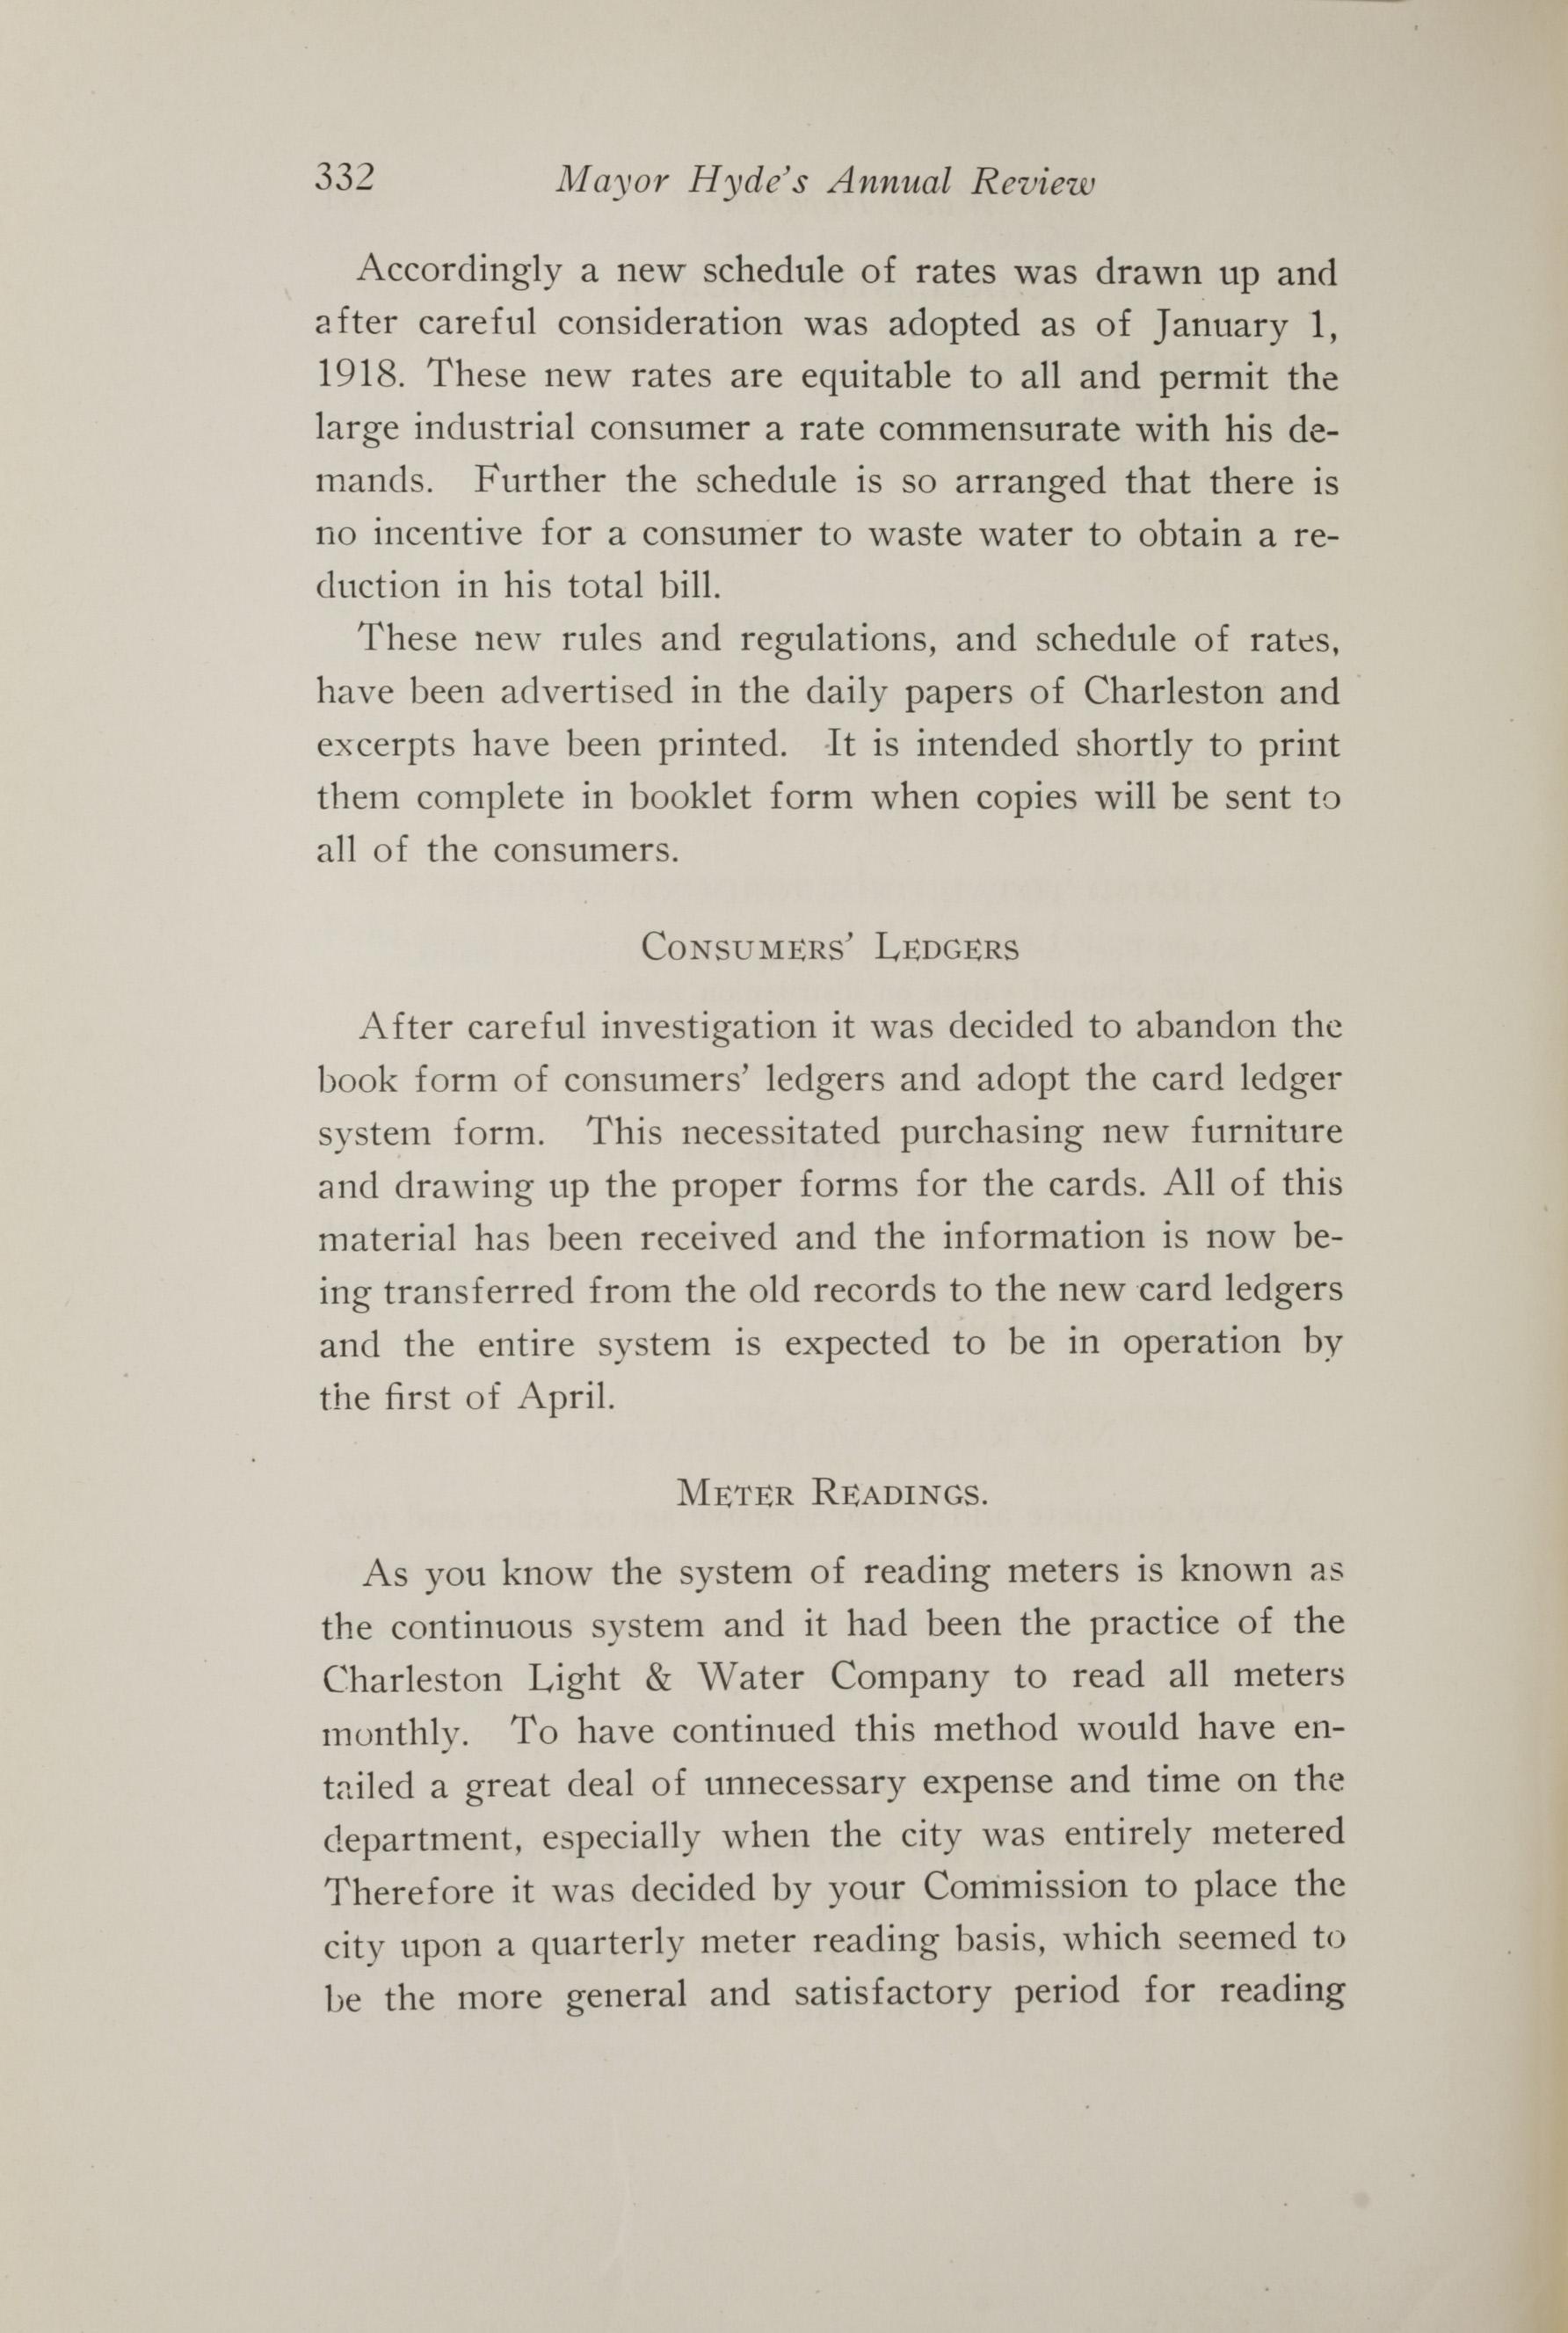 Charleston Yearbook, 1917, page 332